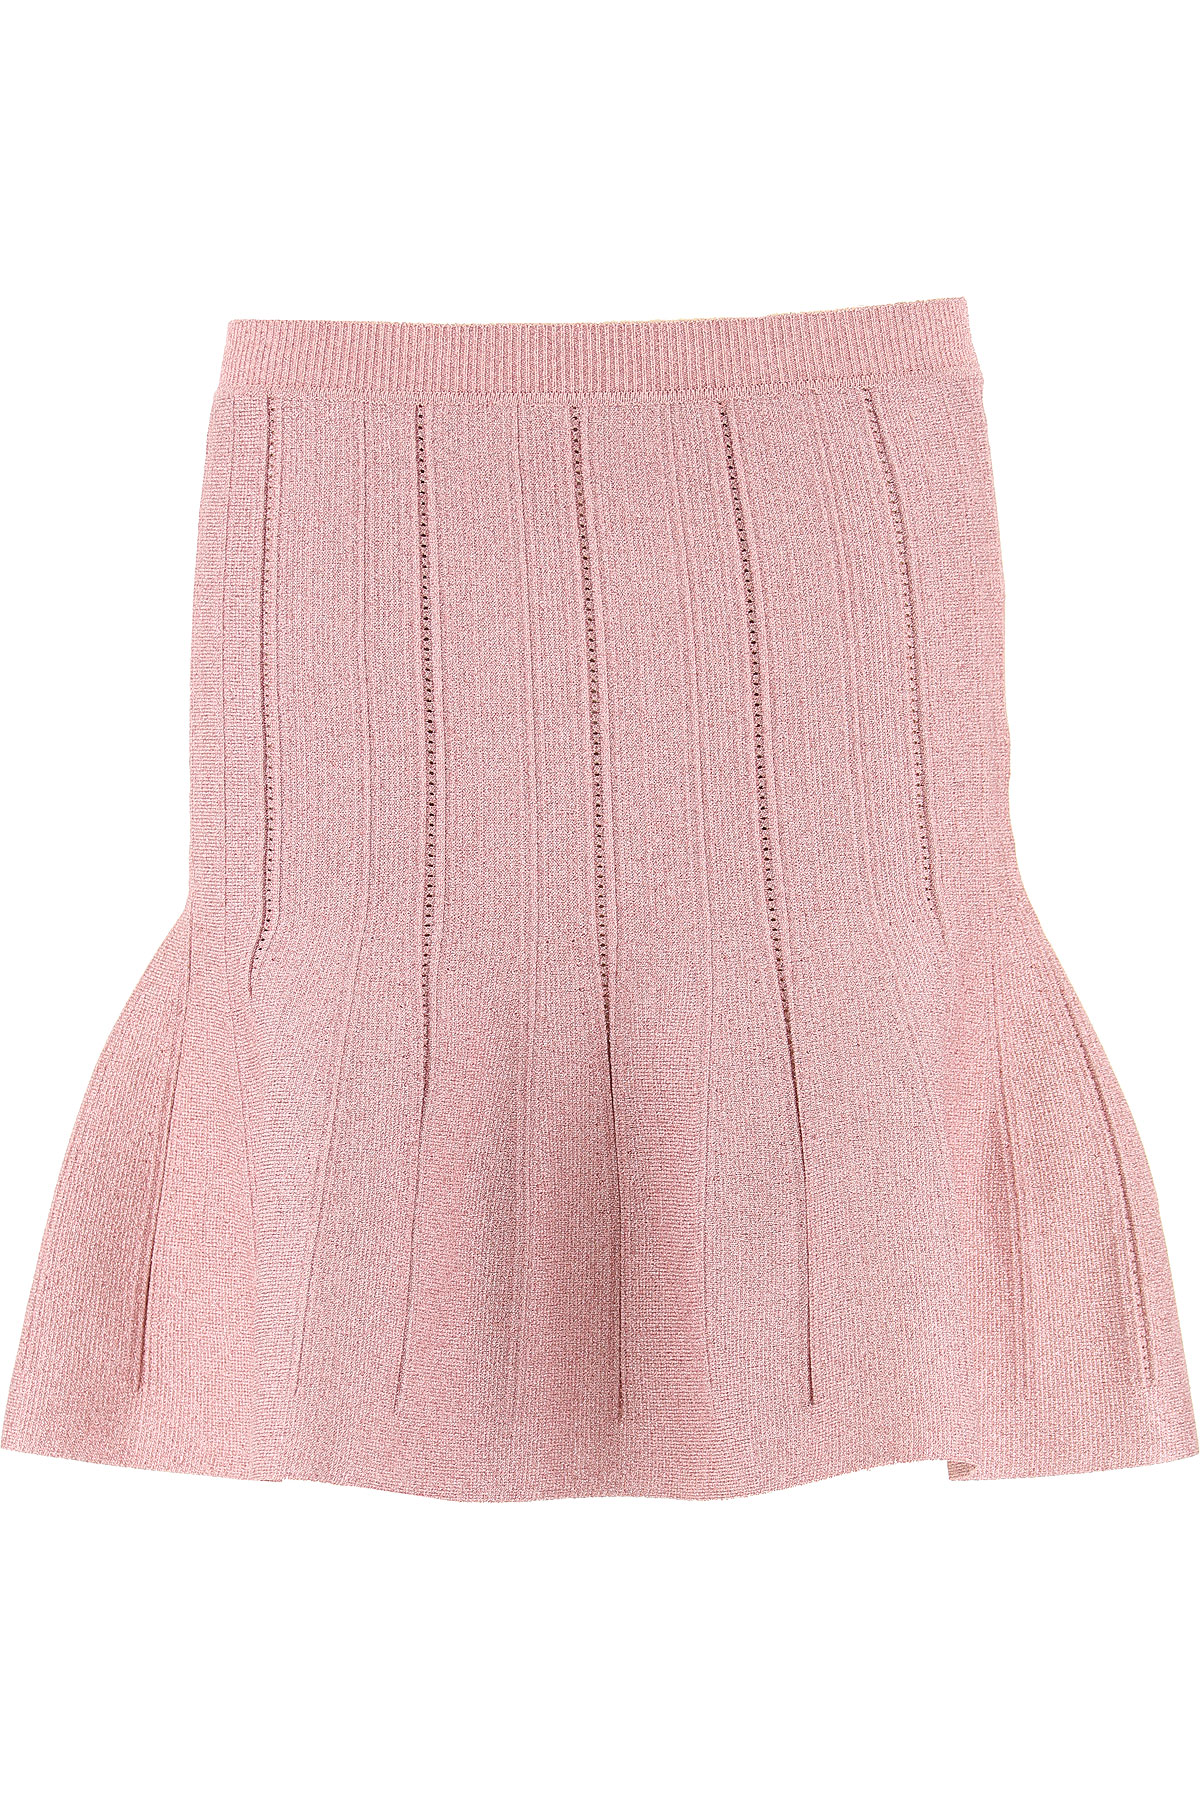 Image of Alberta Ferretti Skirt for Women, Pink, polyamide, 2017, 26 28